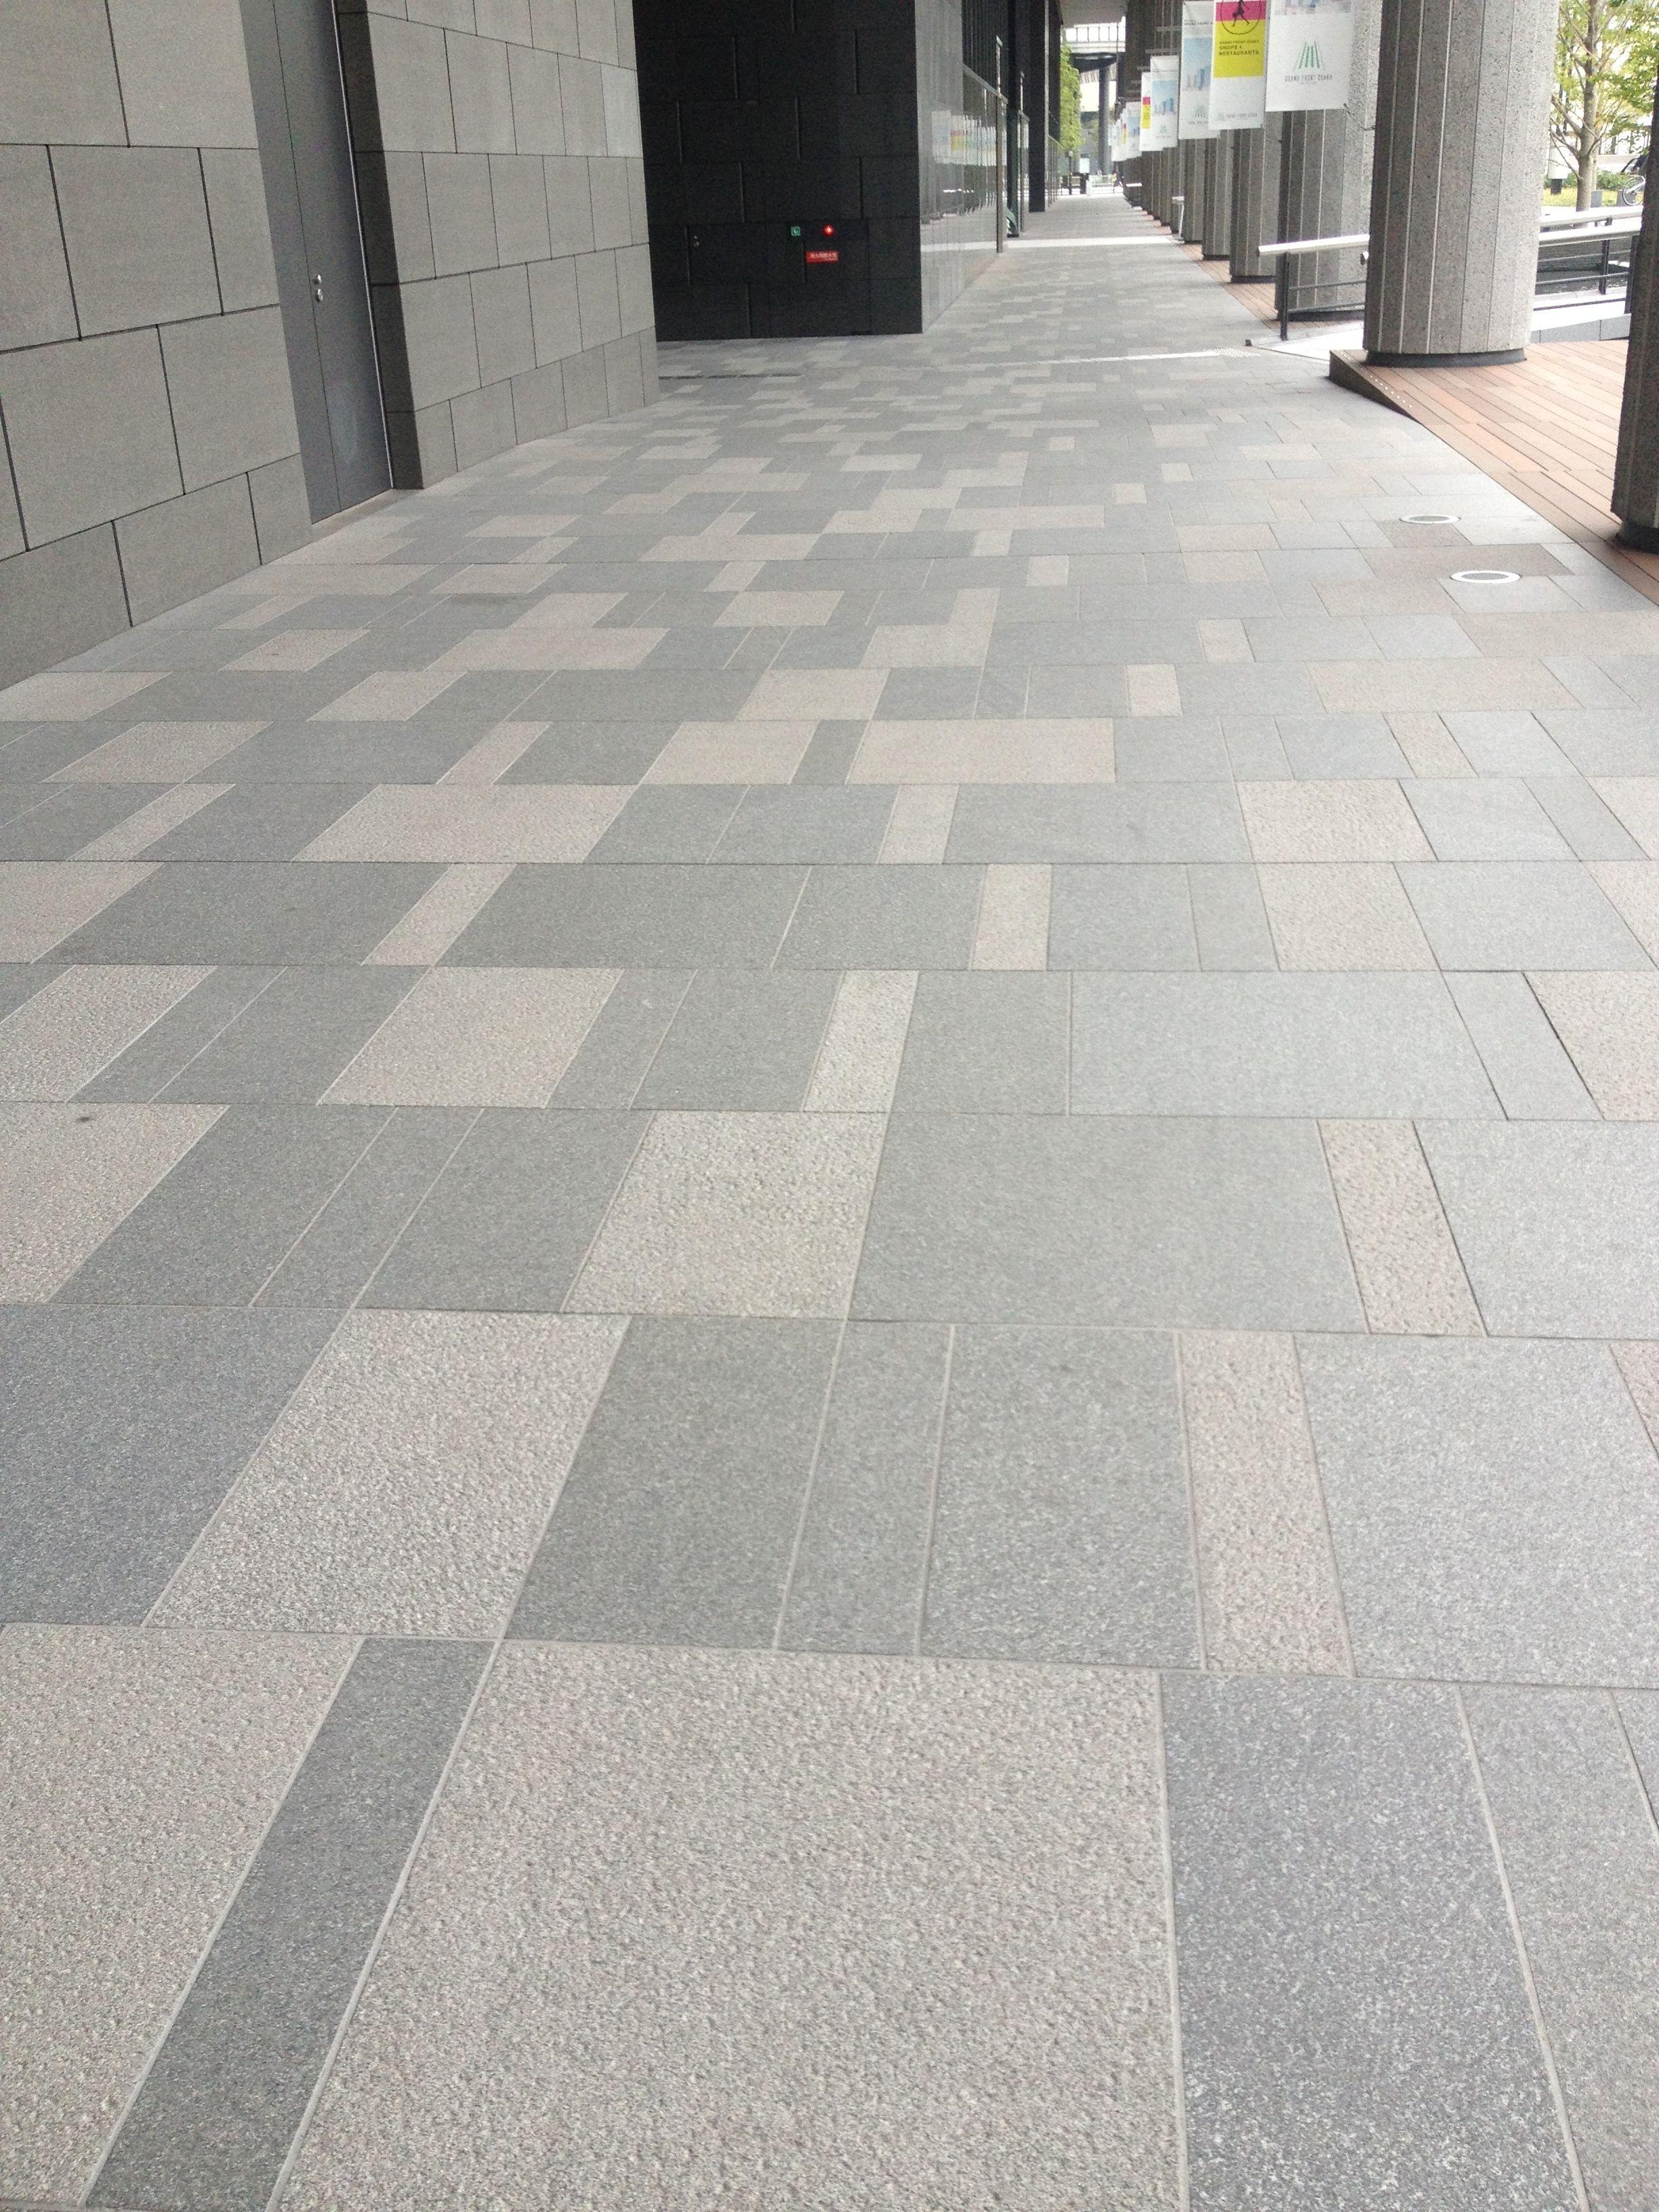 Pin By Mahfooz Khan On Kota Blue Sandblast Paving Design Paving Pattern Pavement Design